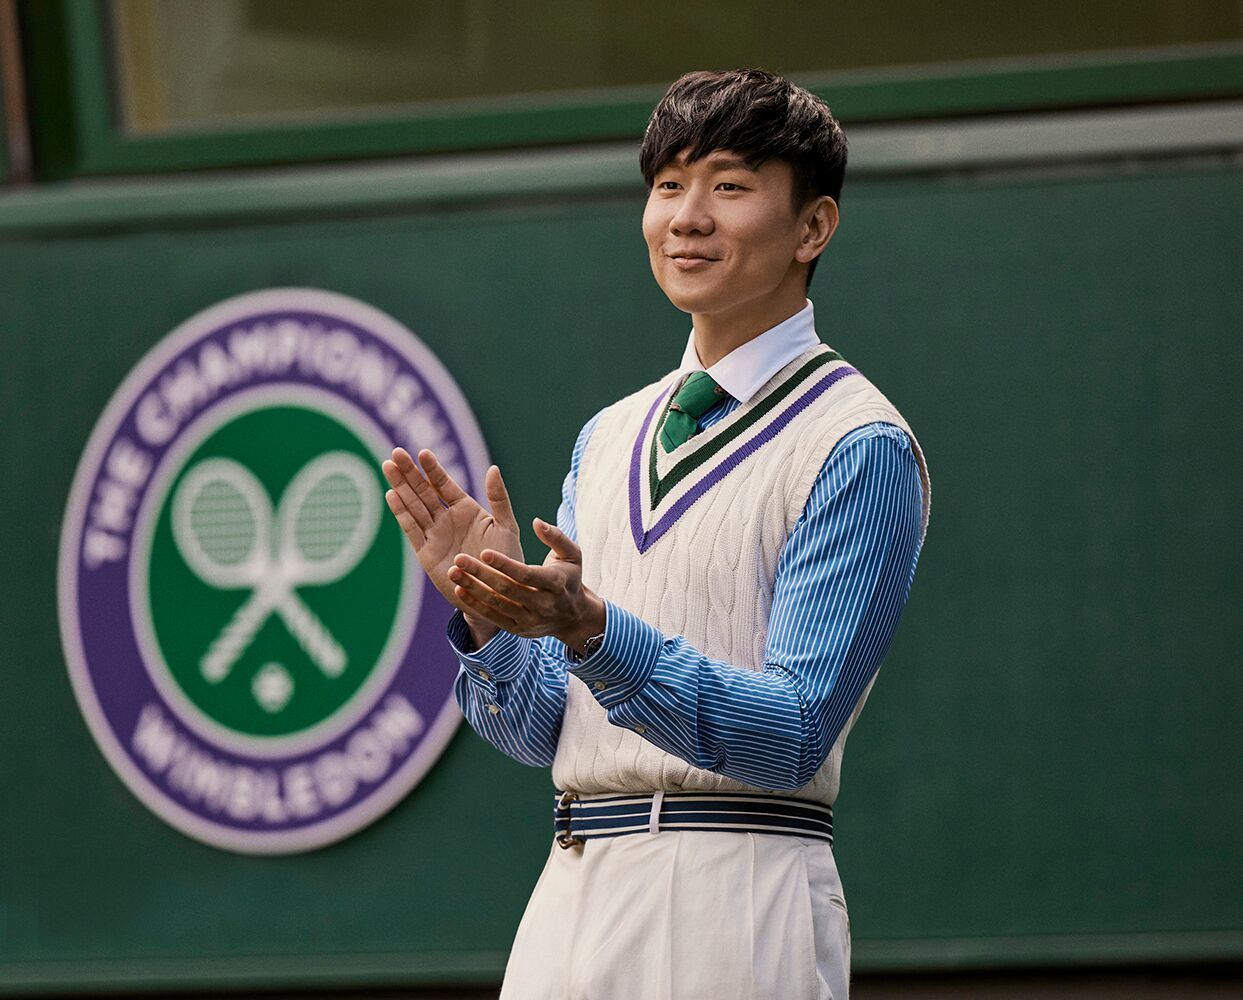 Polo Ralph Lauren X 2019 溫布頓網球錦標賽形象大使林俊傑